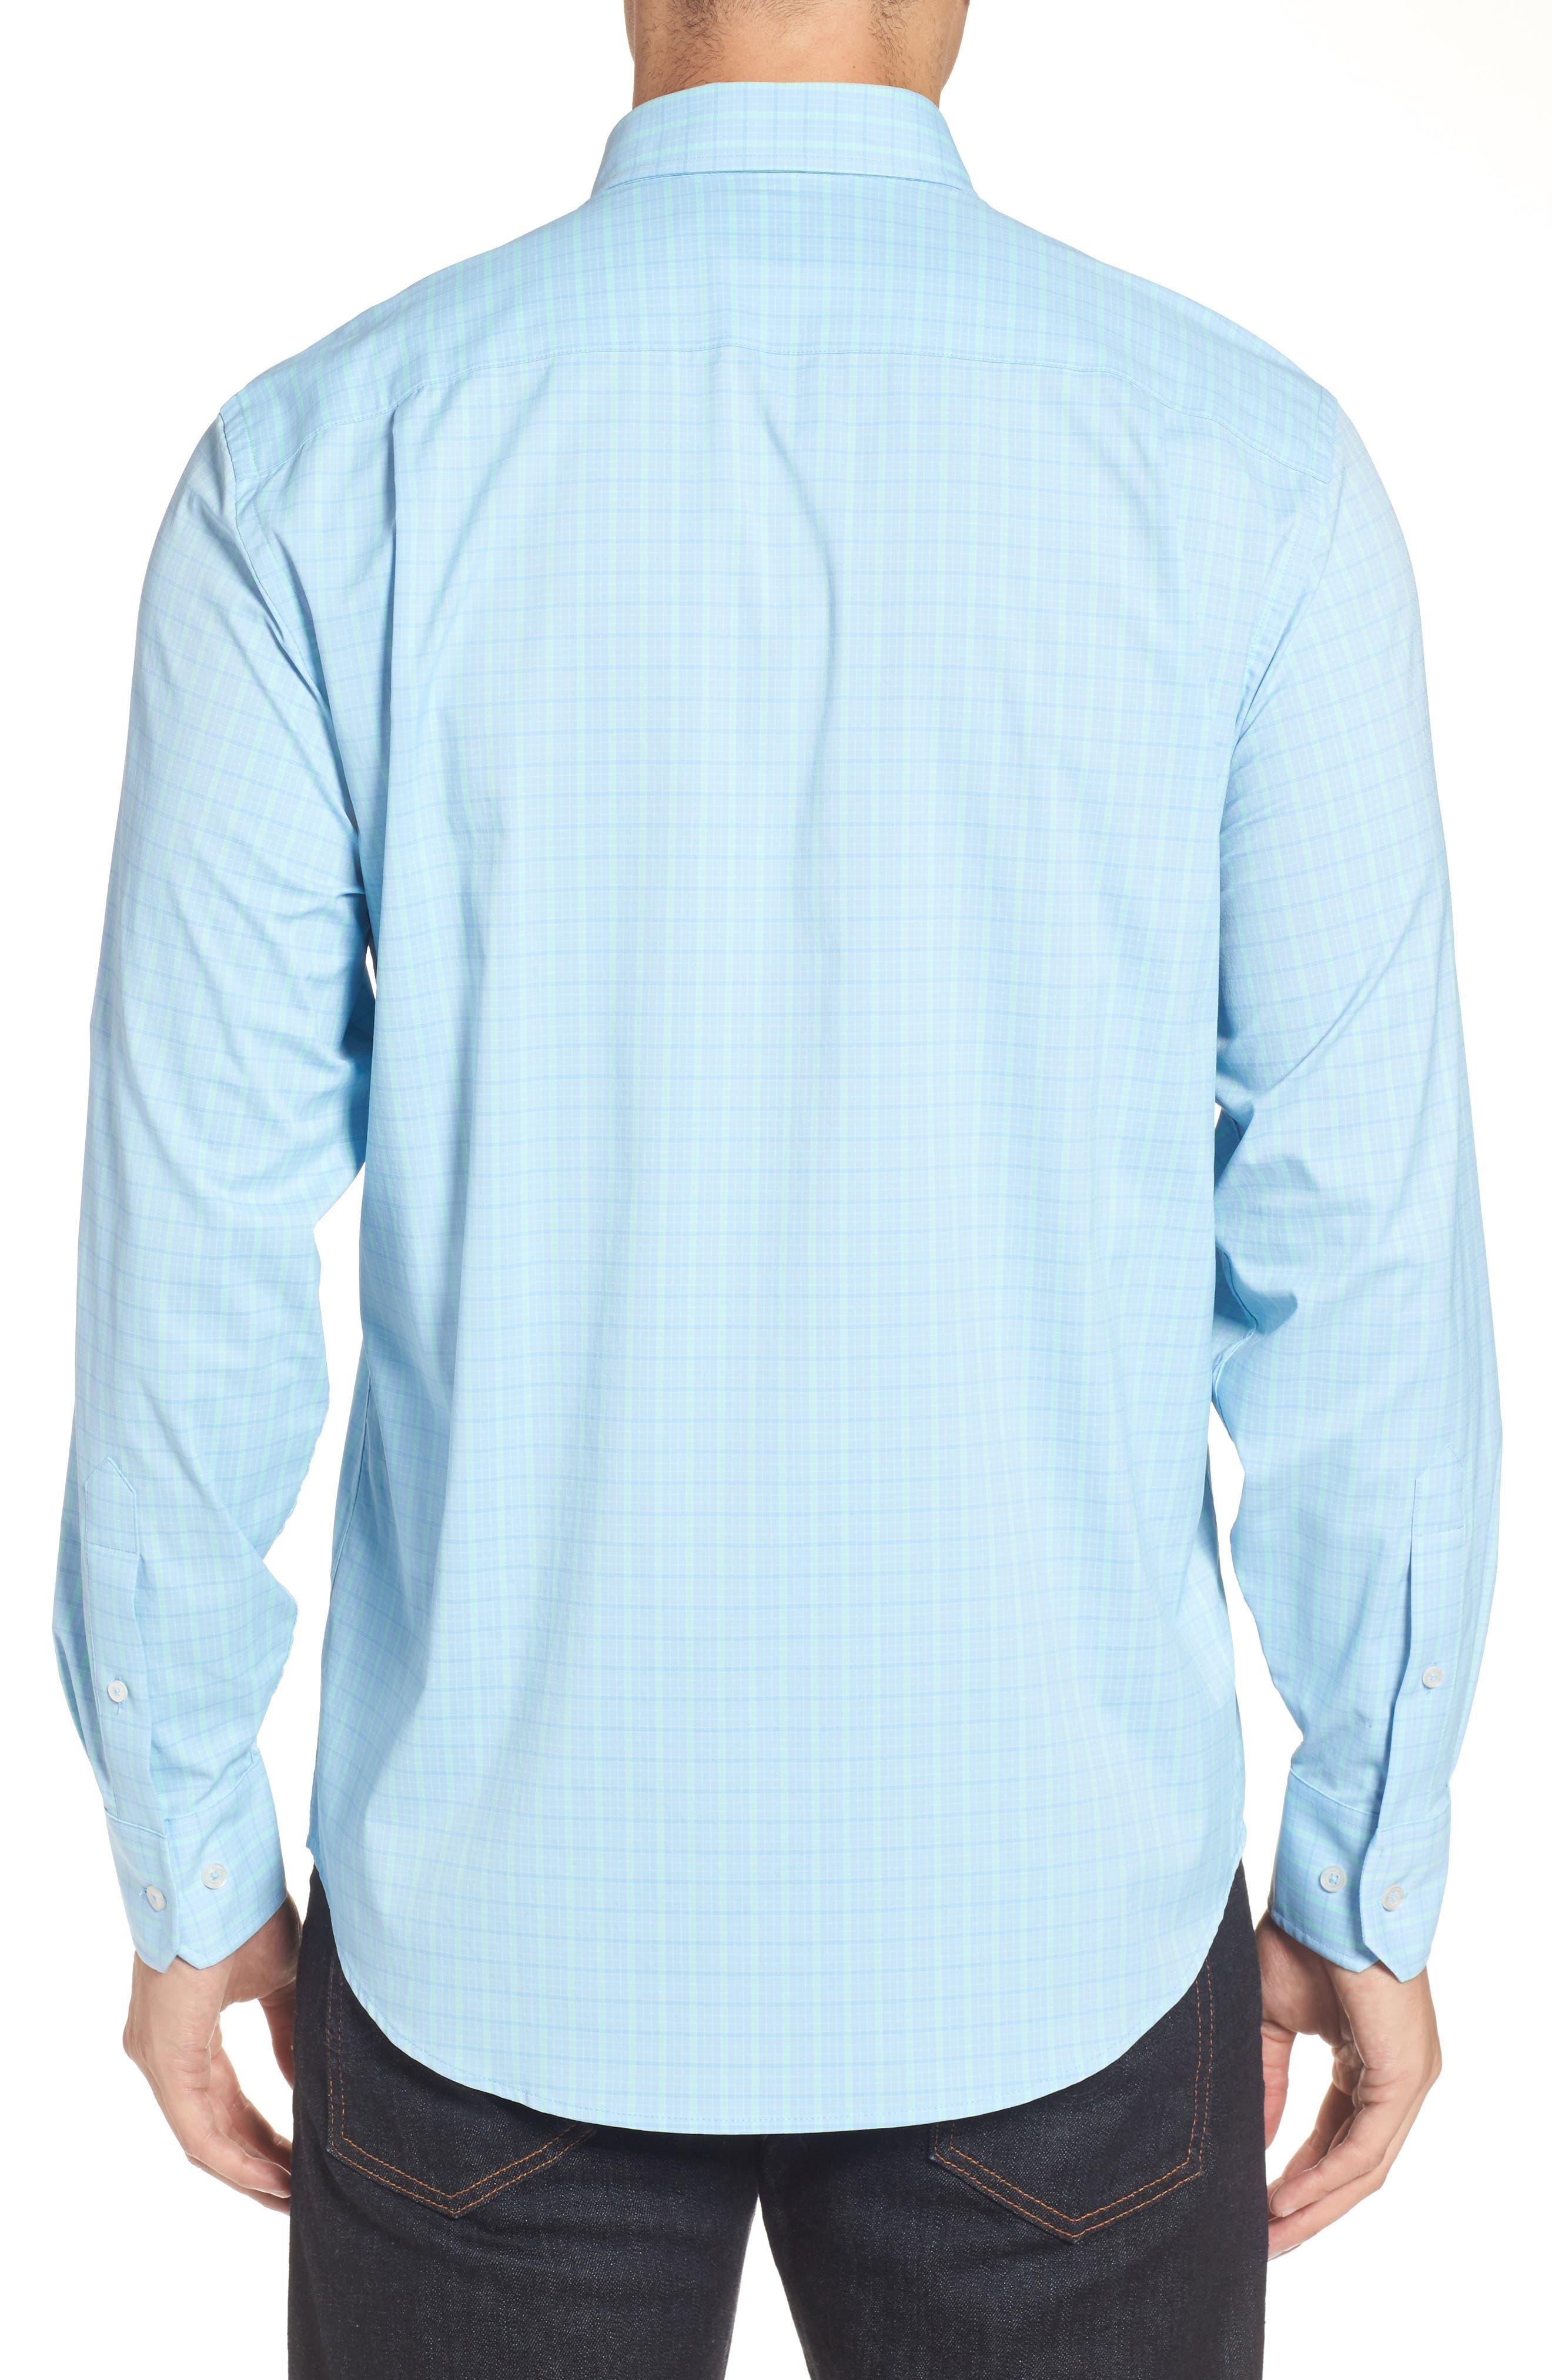 Intercoastal Gordia Plaid Sport Shirt,                             Alternate thumbnail 4, color,